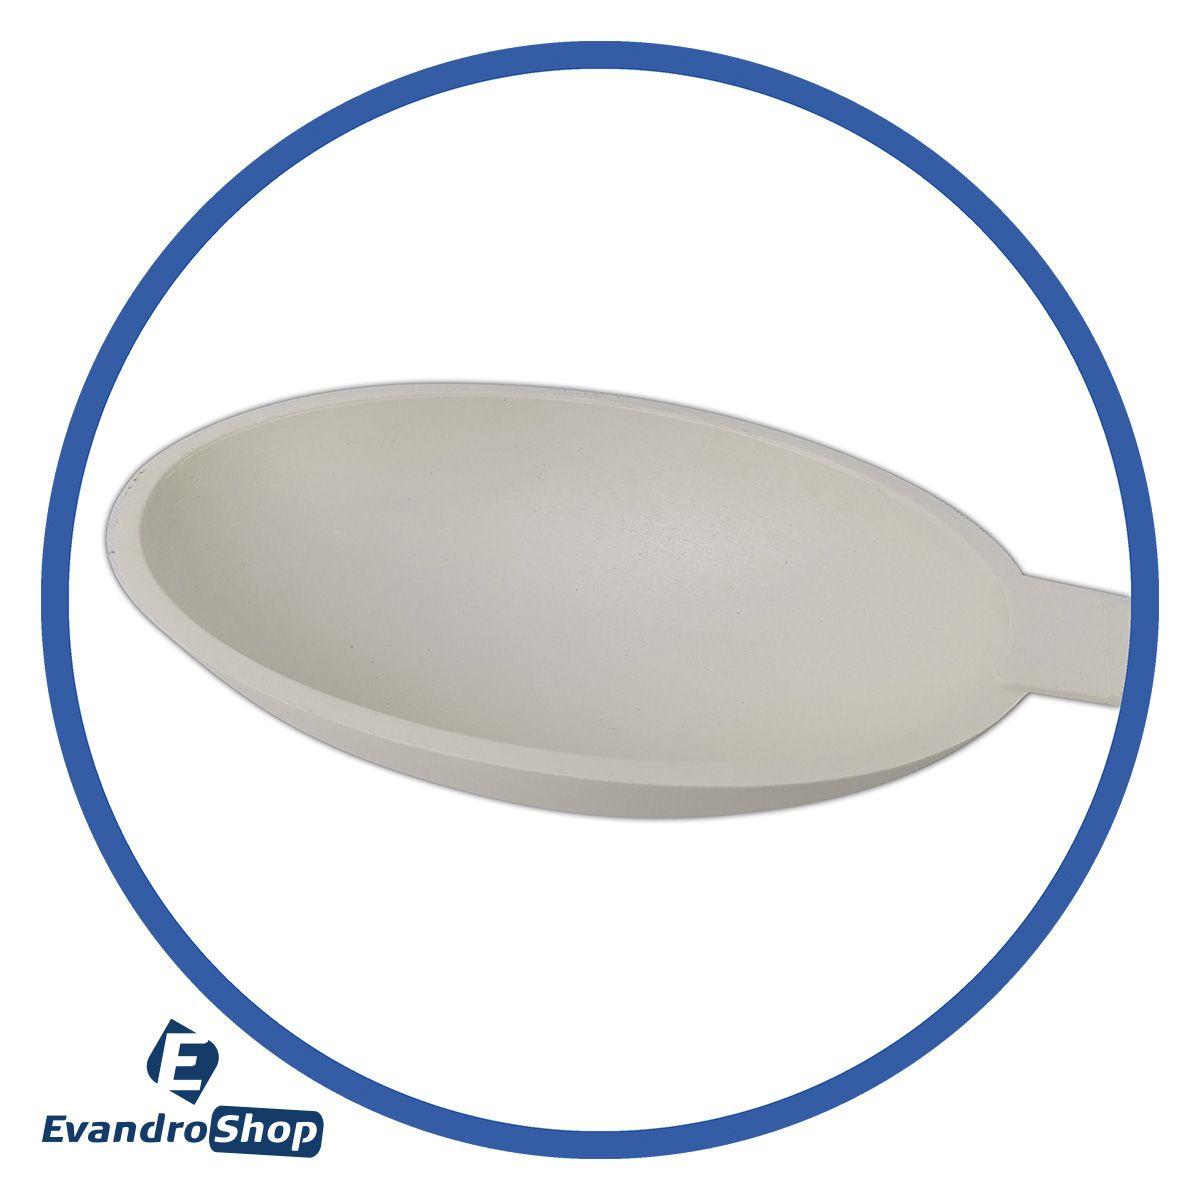 Colher Concova Funda  Em Nylon Branca 100x10 Cm - Solrac